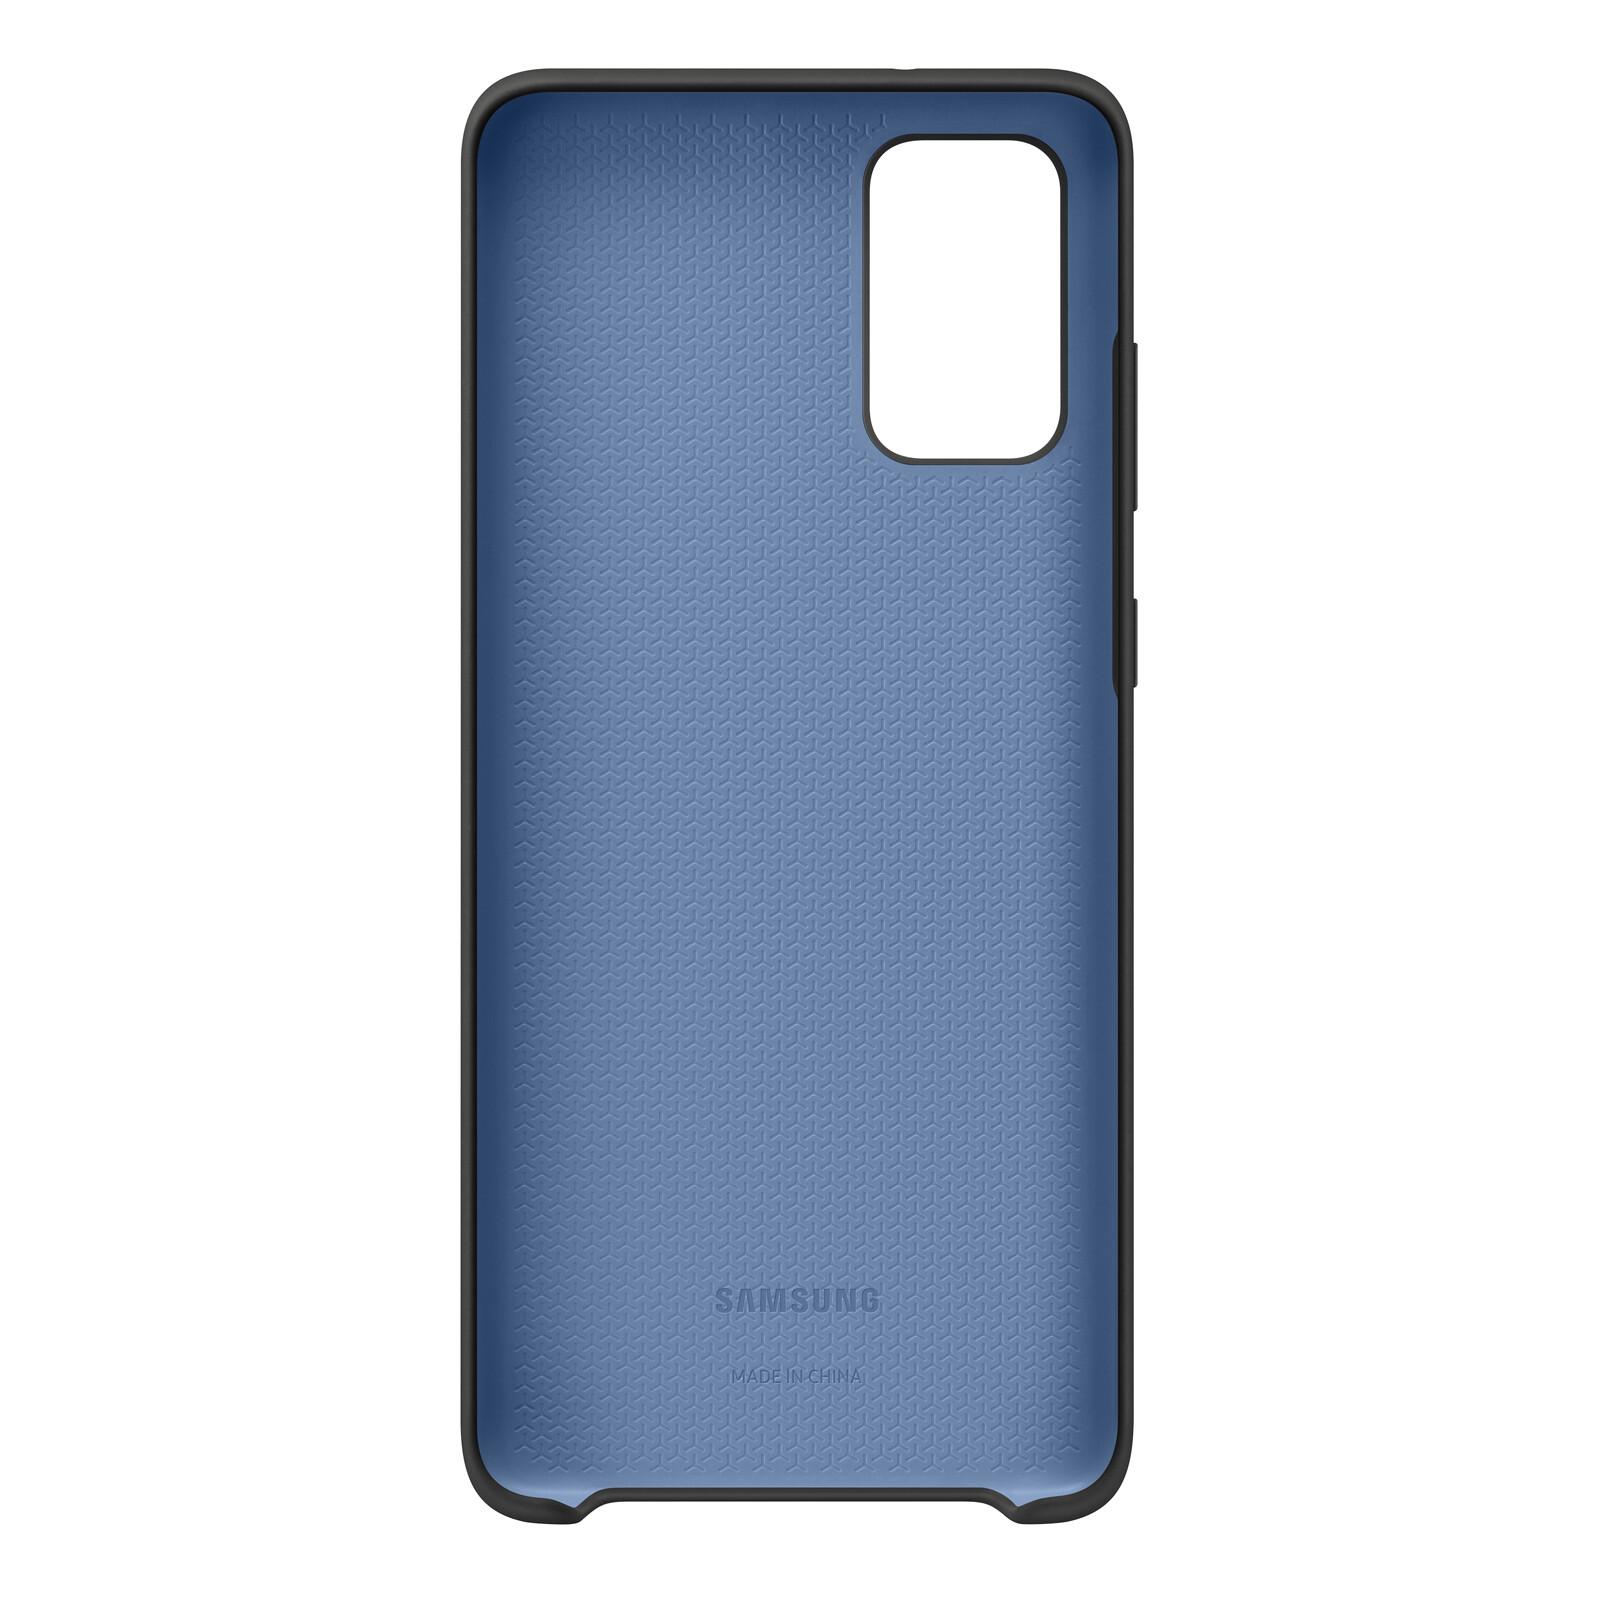 Samsung Back Cover Silicone Galaxy S20+ schwarz